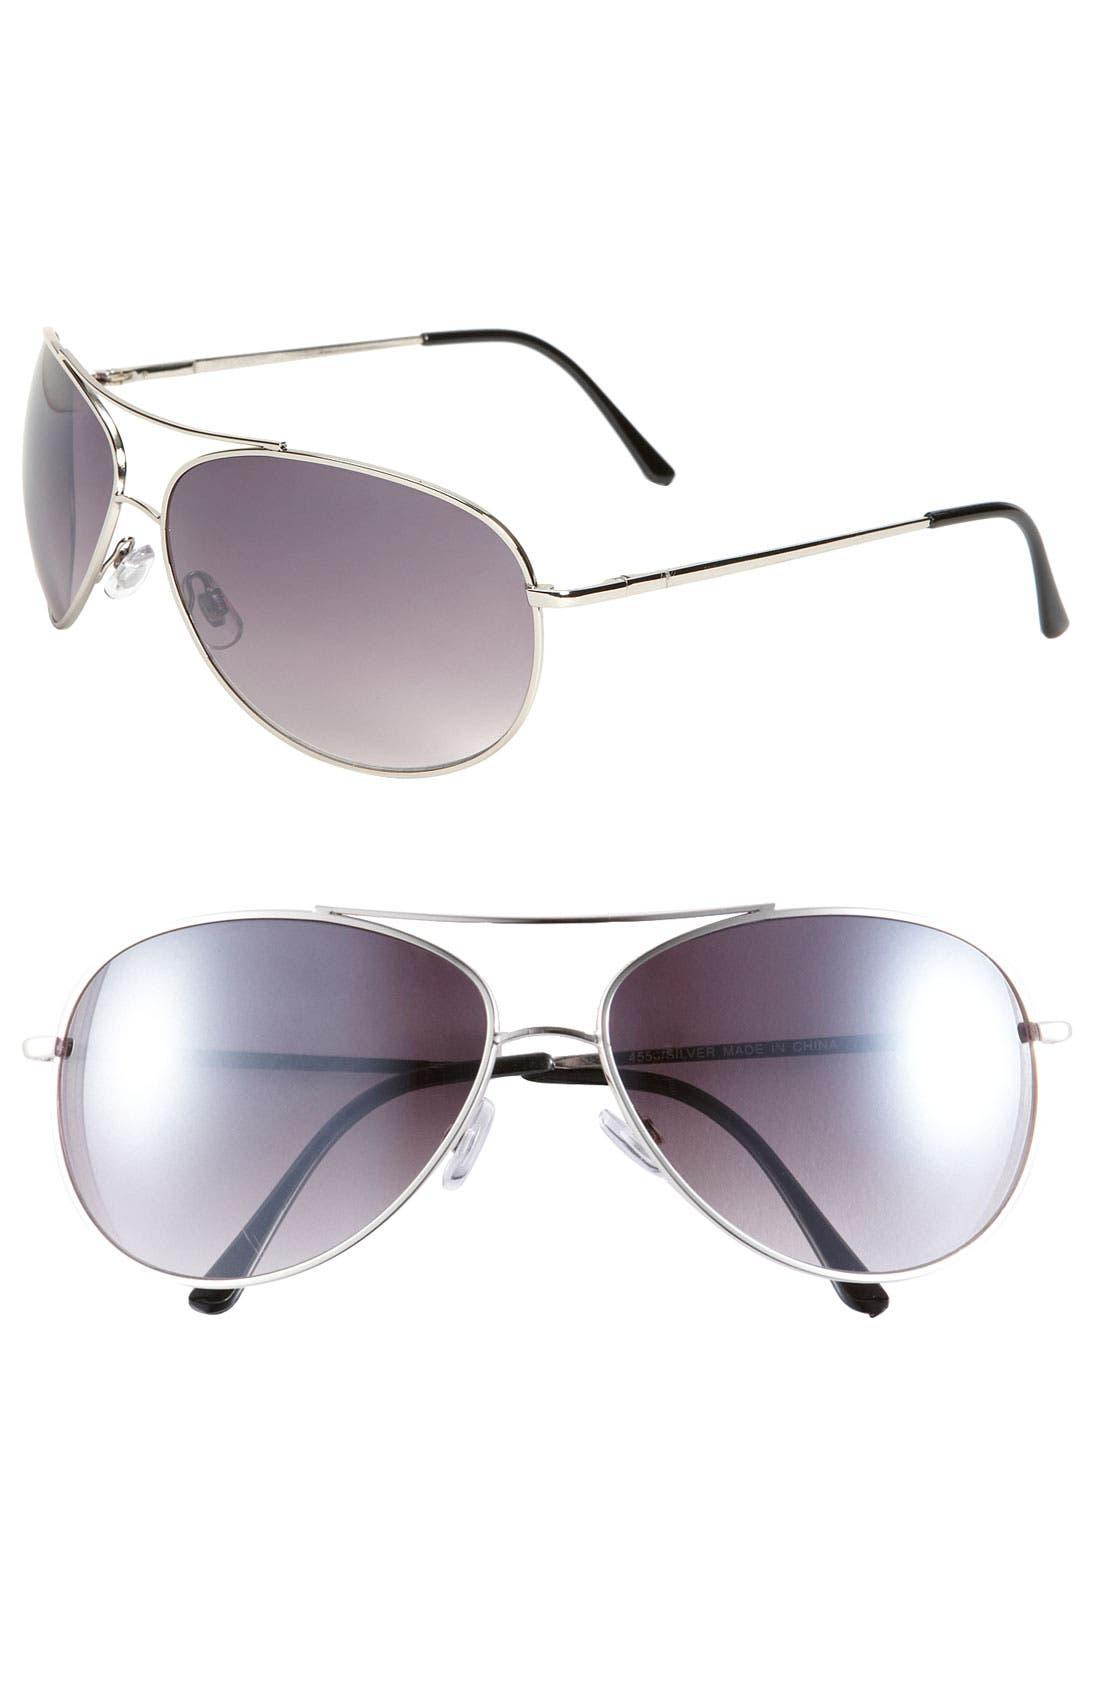 'Strike' Aviator Sunglasses,                             Main thumbnail 1, color,                             069